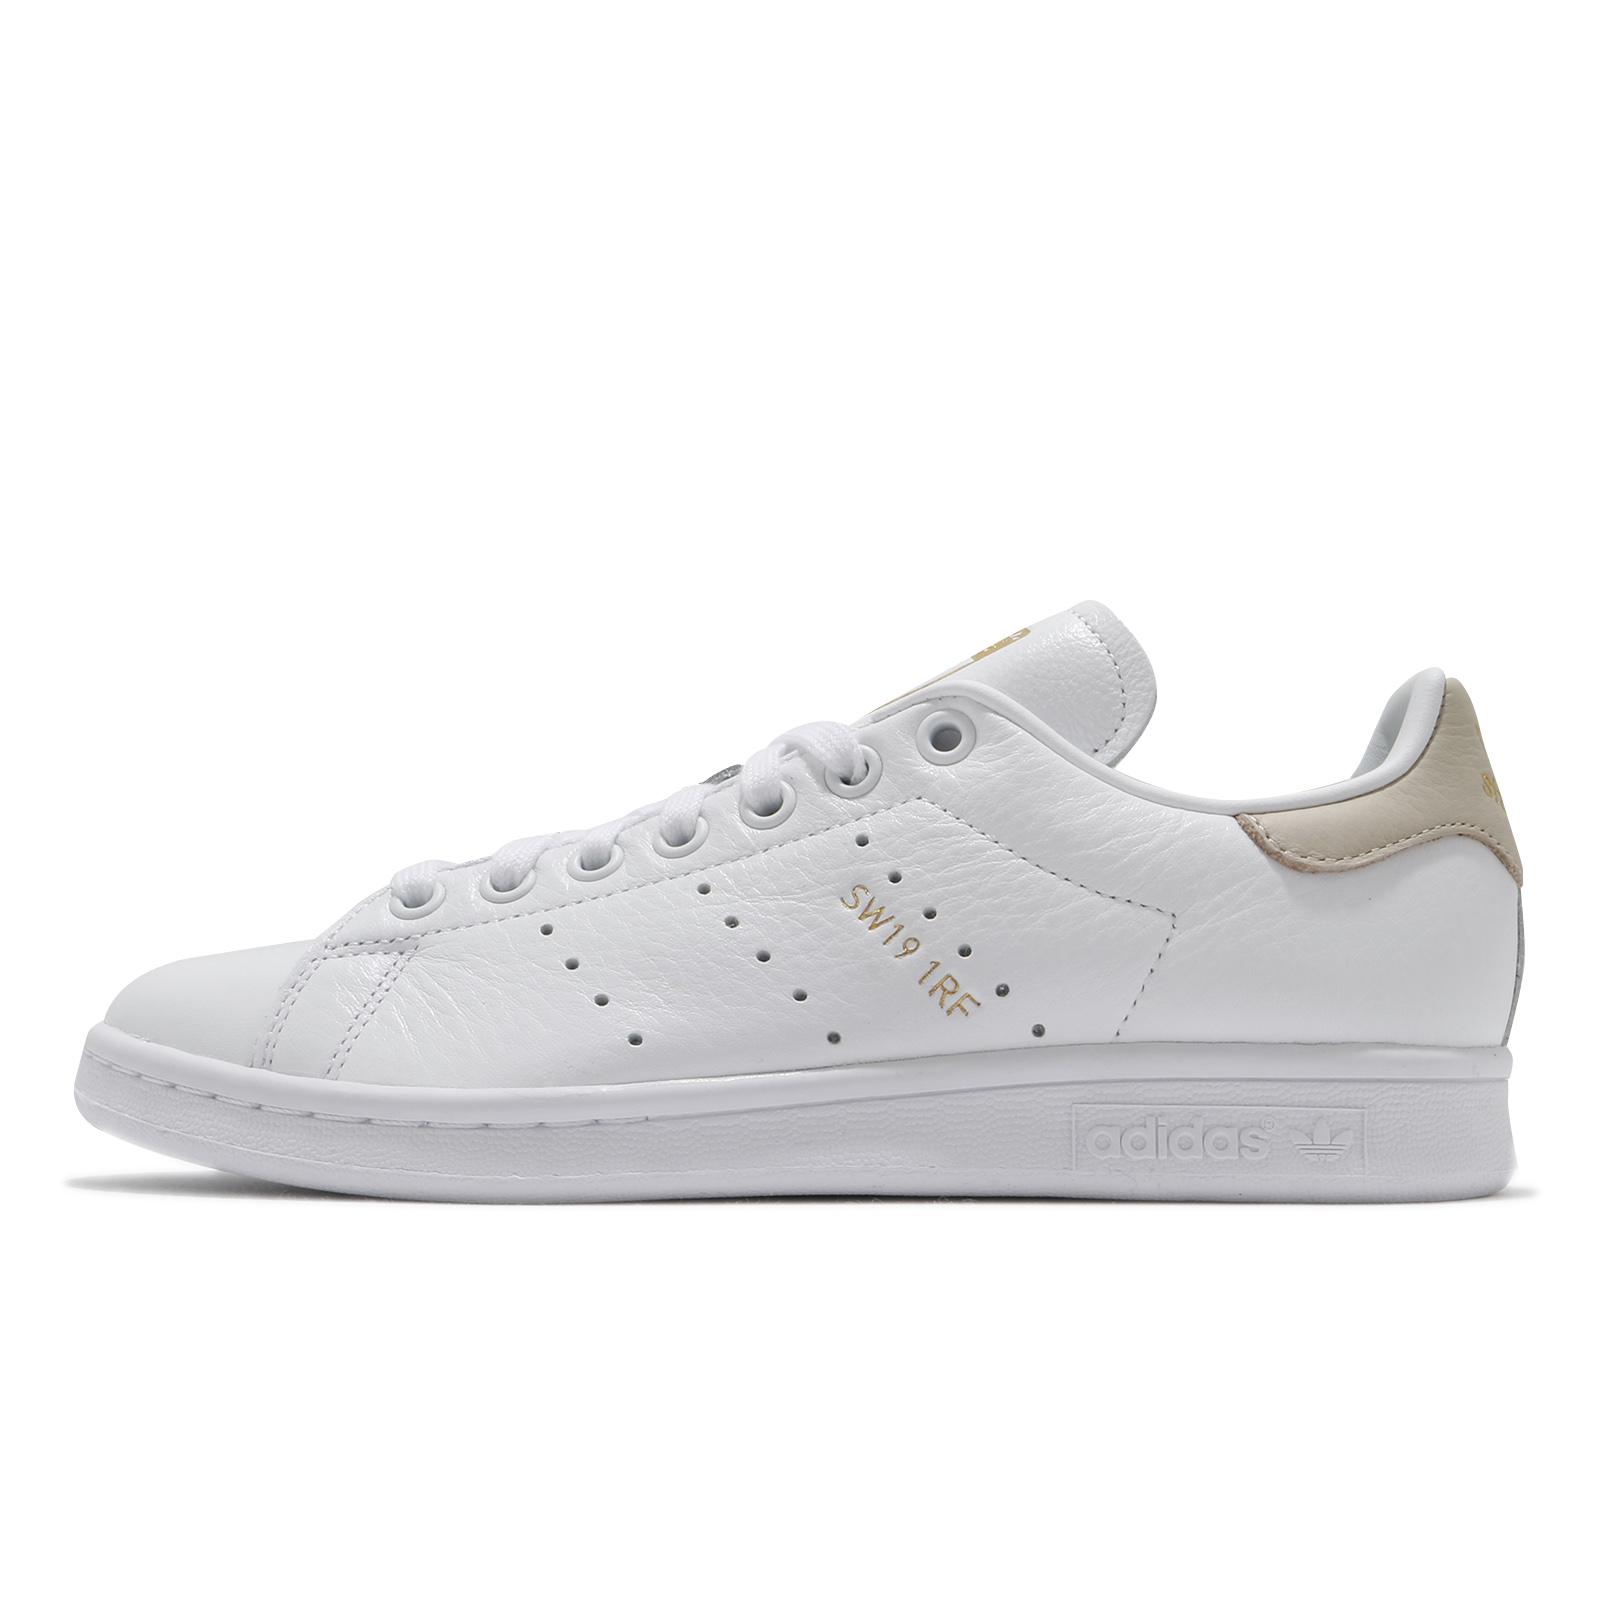 adidas 休閒鞋 Stan Smith 白 金 紅 草莓 小白鞋 愛迪達 三葉草 女鞋 男鞋【ACS】 FY9202